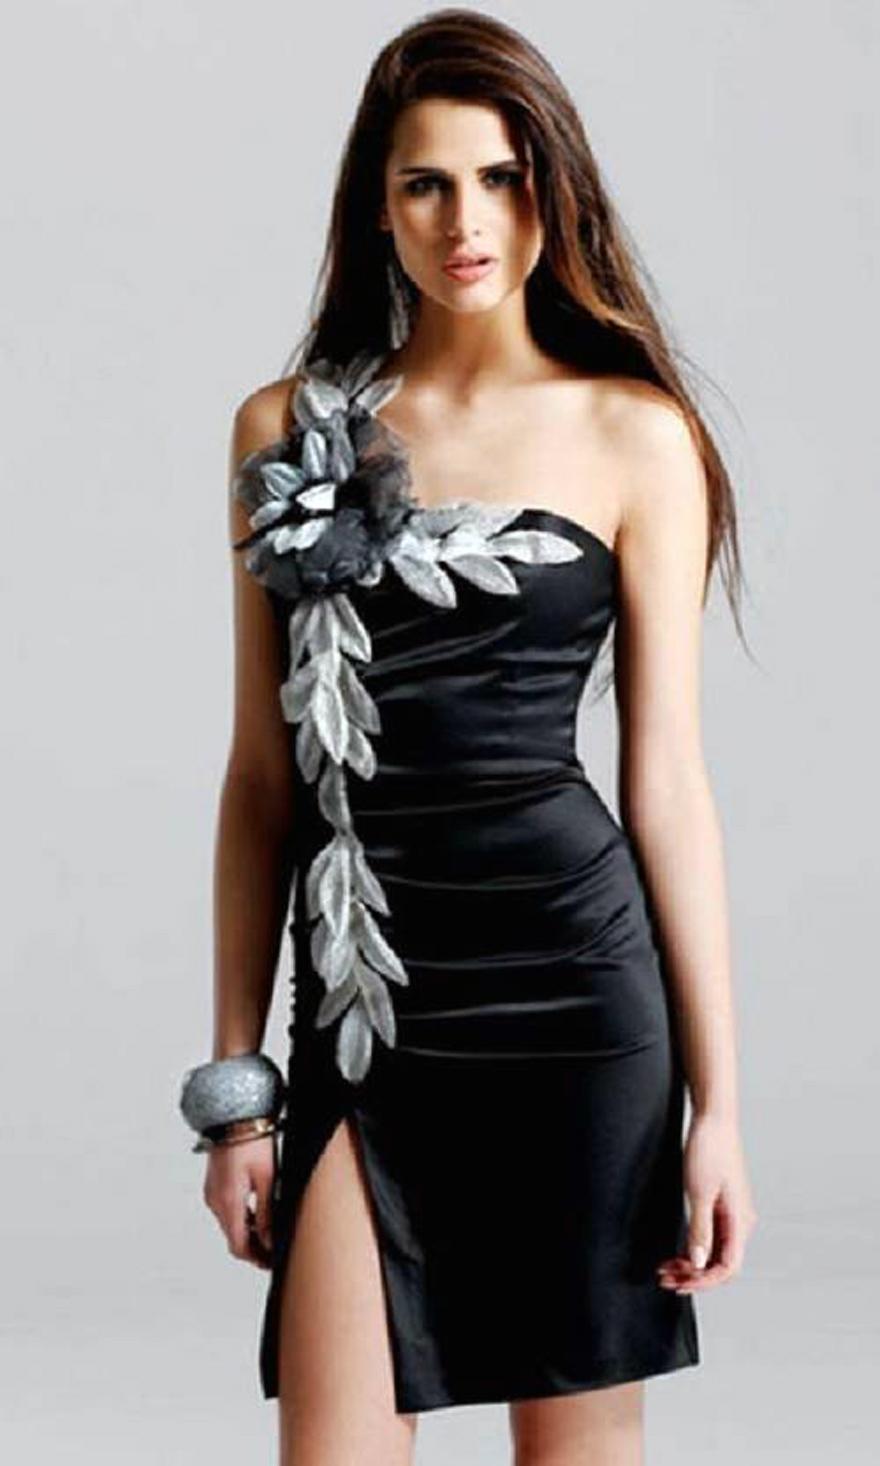 Short Tight Prom Dresses Styles - Inofashionstyle.com